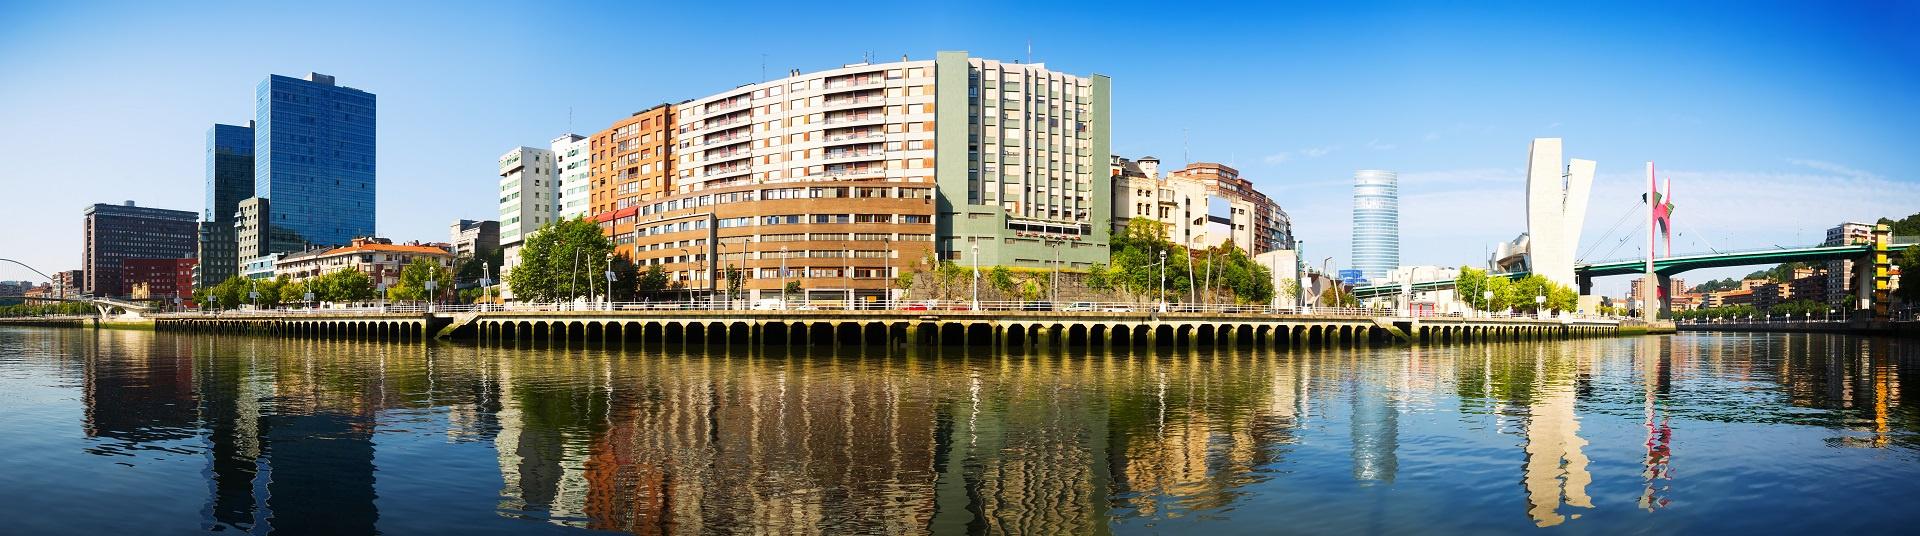 Week-end pas cher Bilbao